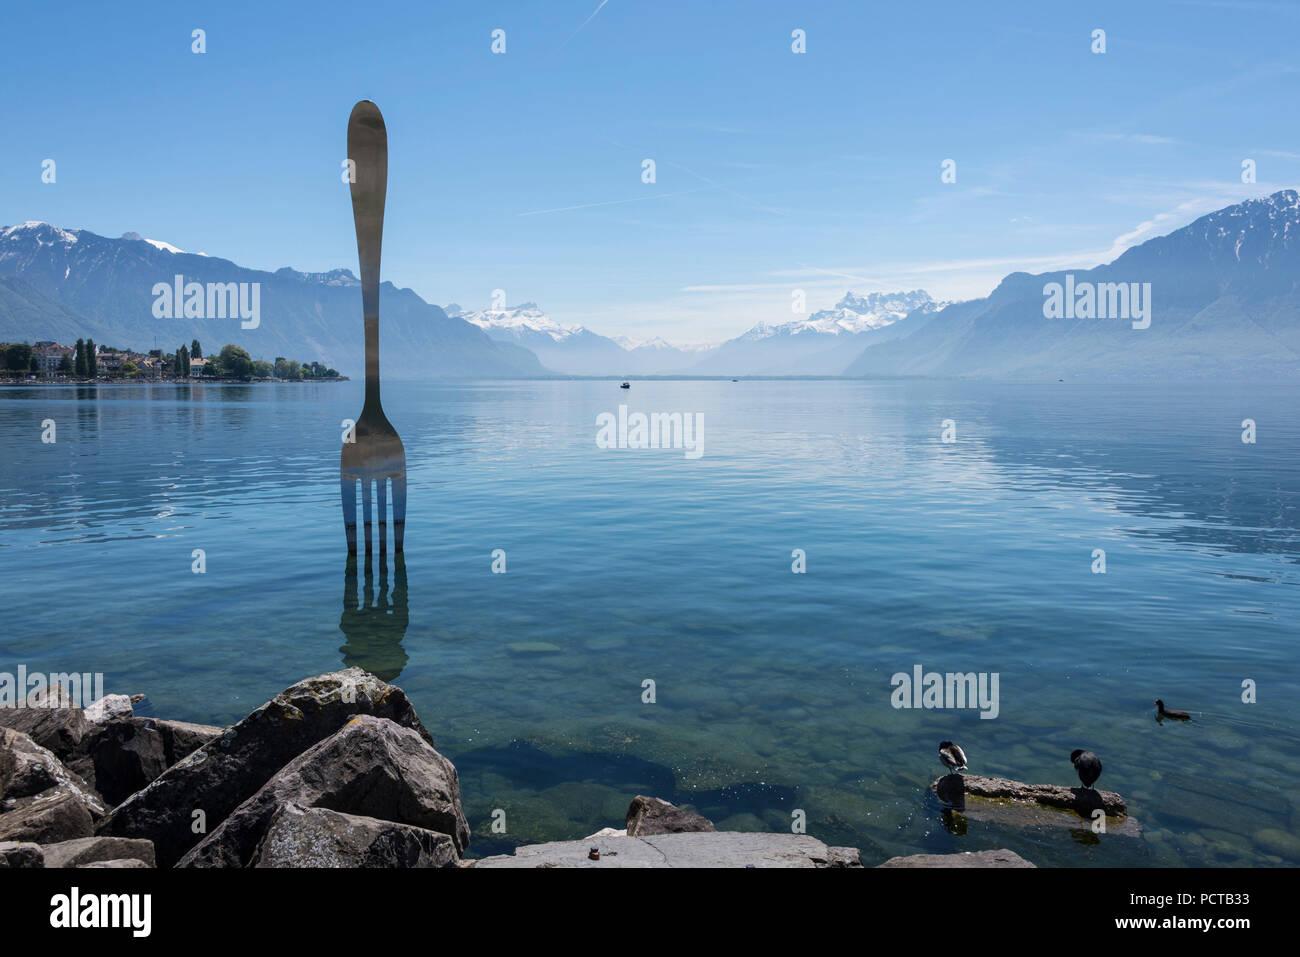 Giant fork 'la fourchette, Heroine du Leman' in Lake Geneva, Vevey, Riviera-Pays-d'Enhaut, near Lausanne, canton of Vaud, Western Switzerland, Switzerland - Stock Image